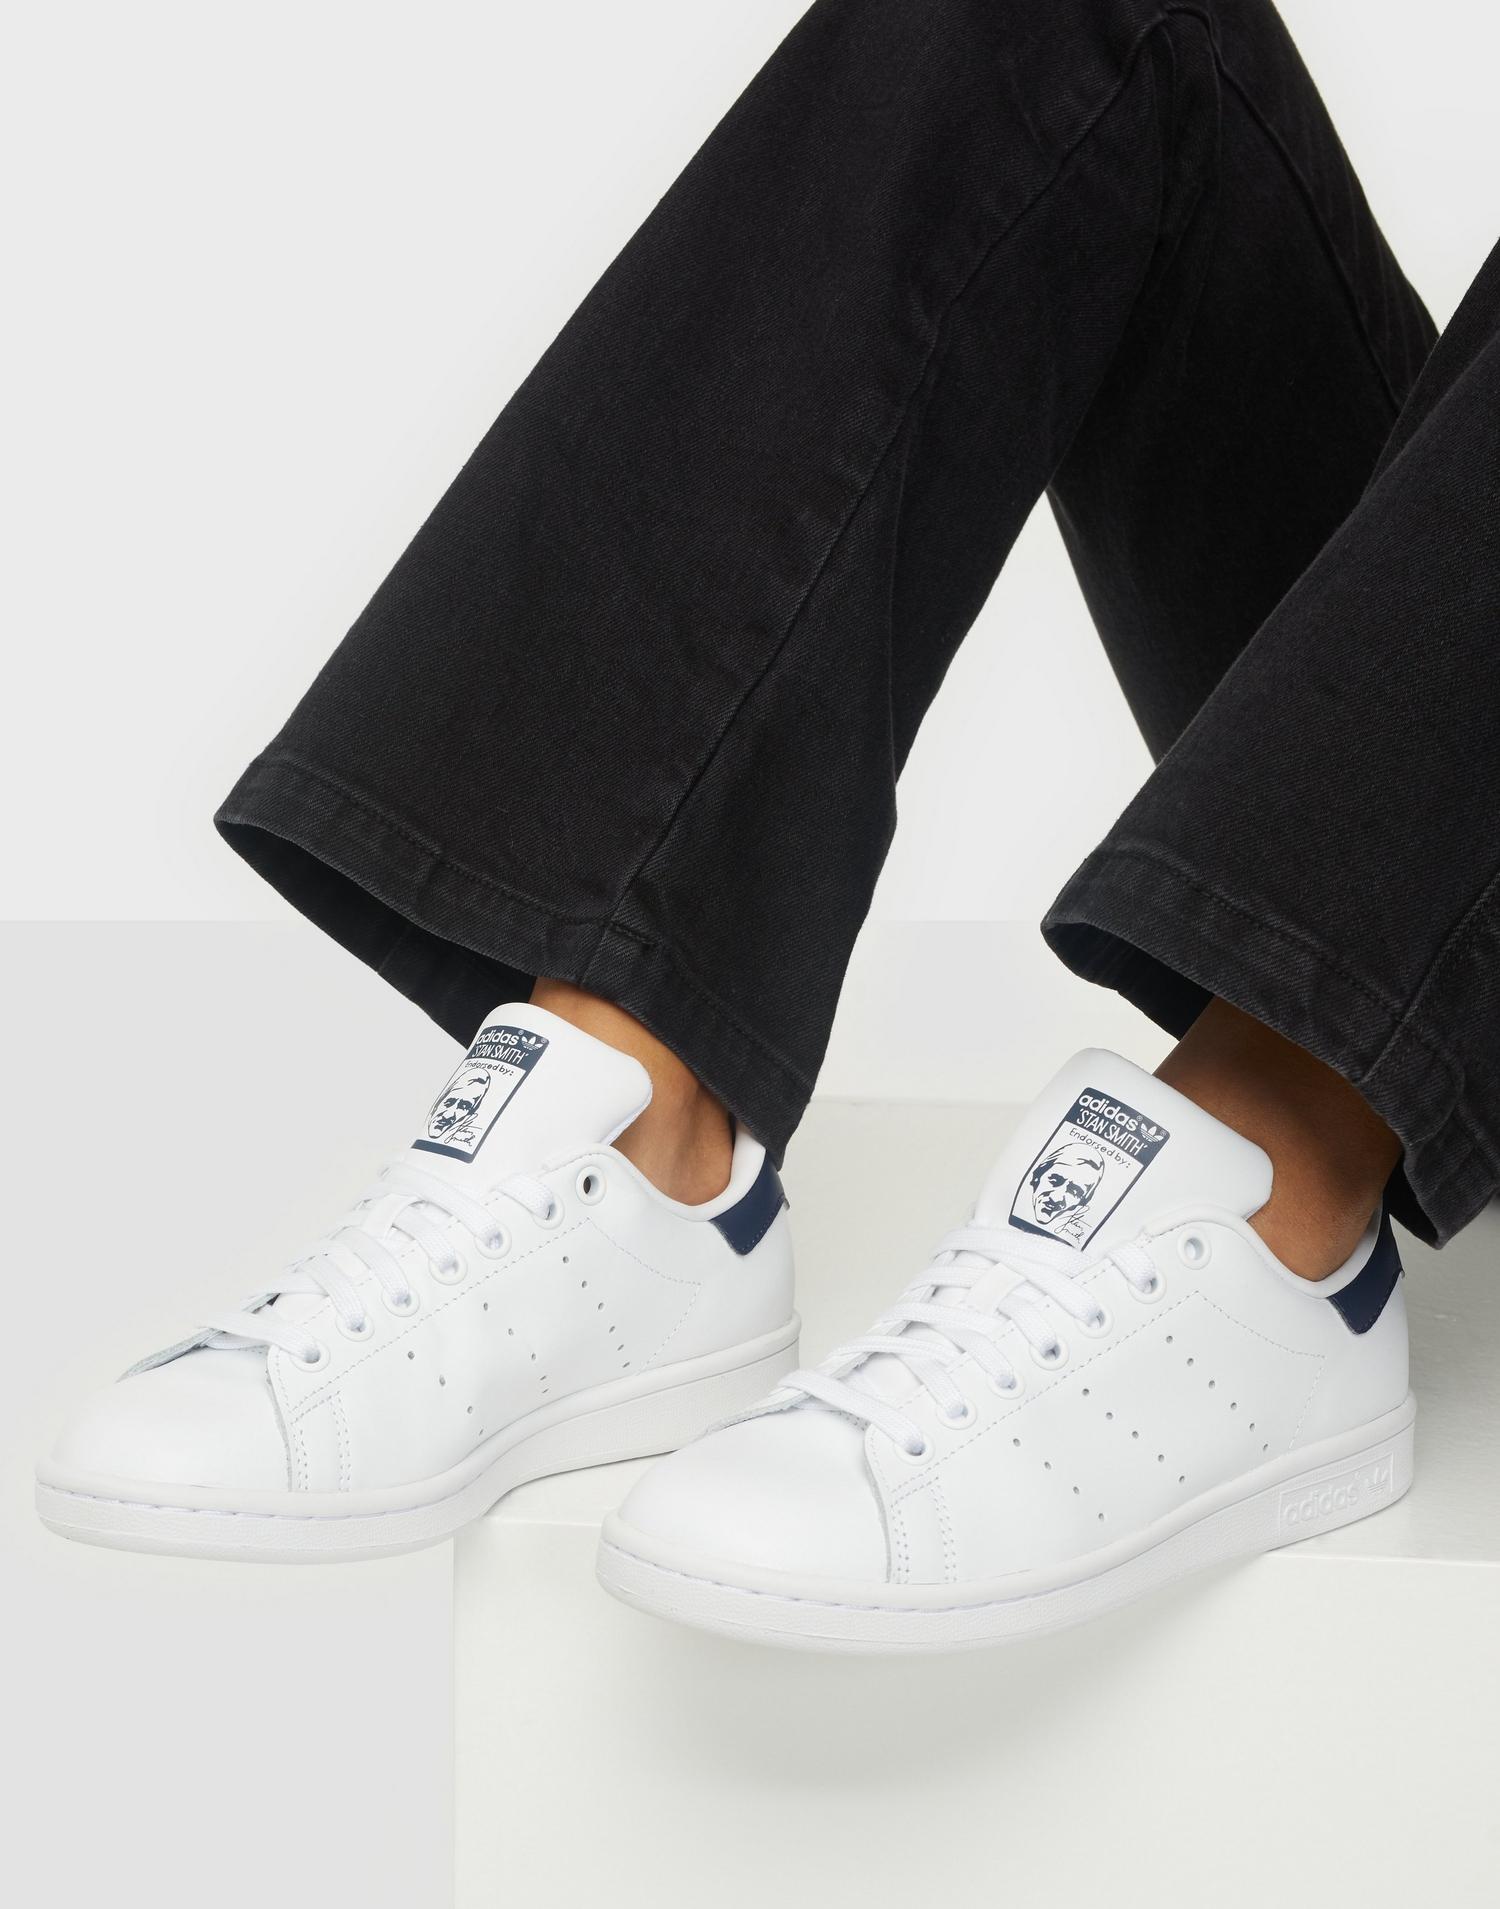 Ett par sneakers i vit textil från Adidas Originals.